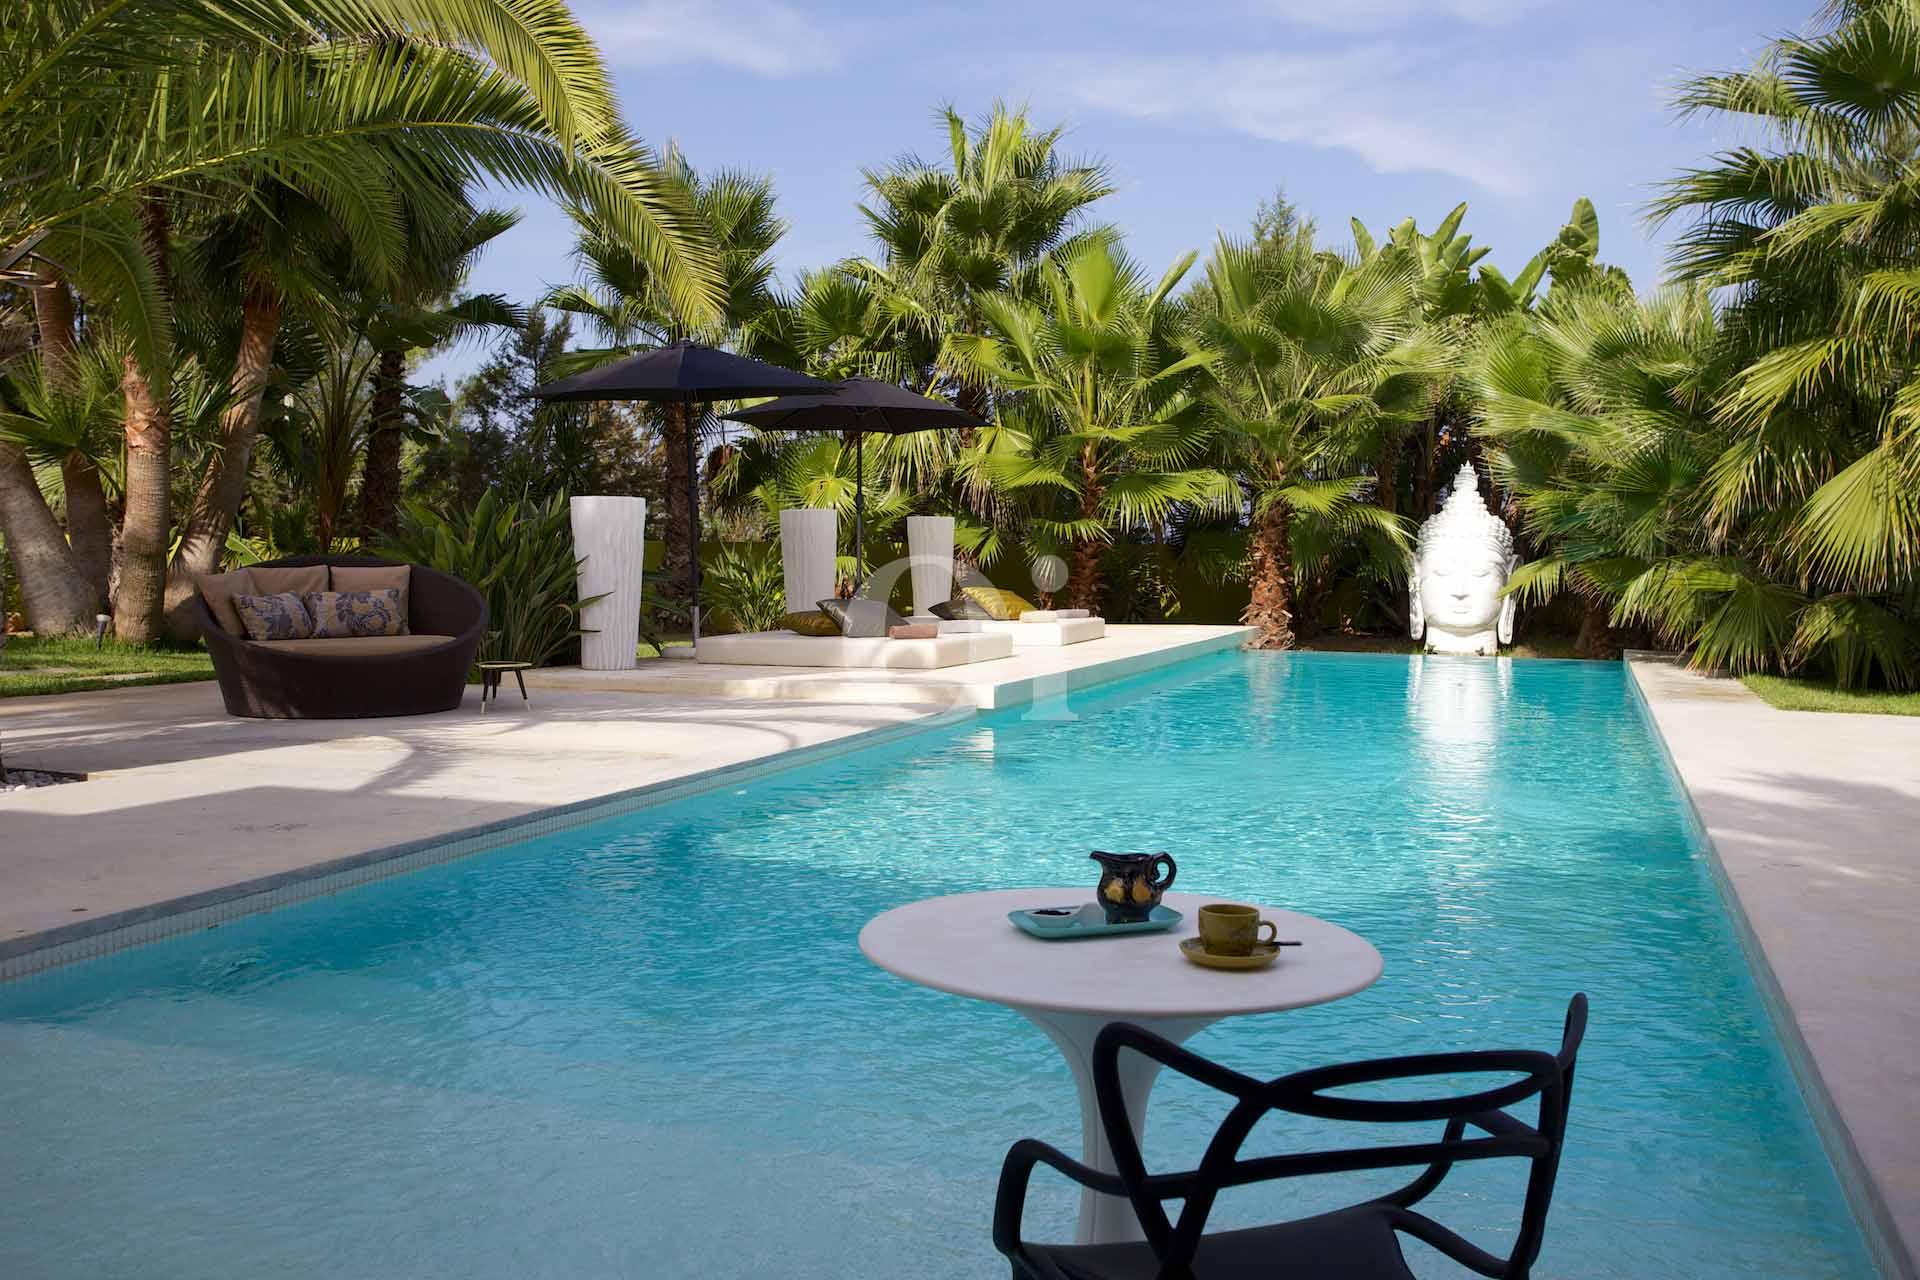 Espectacular piscina exterior